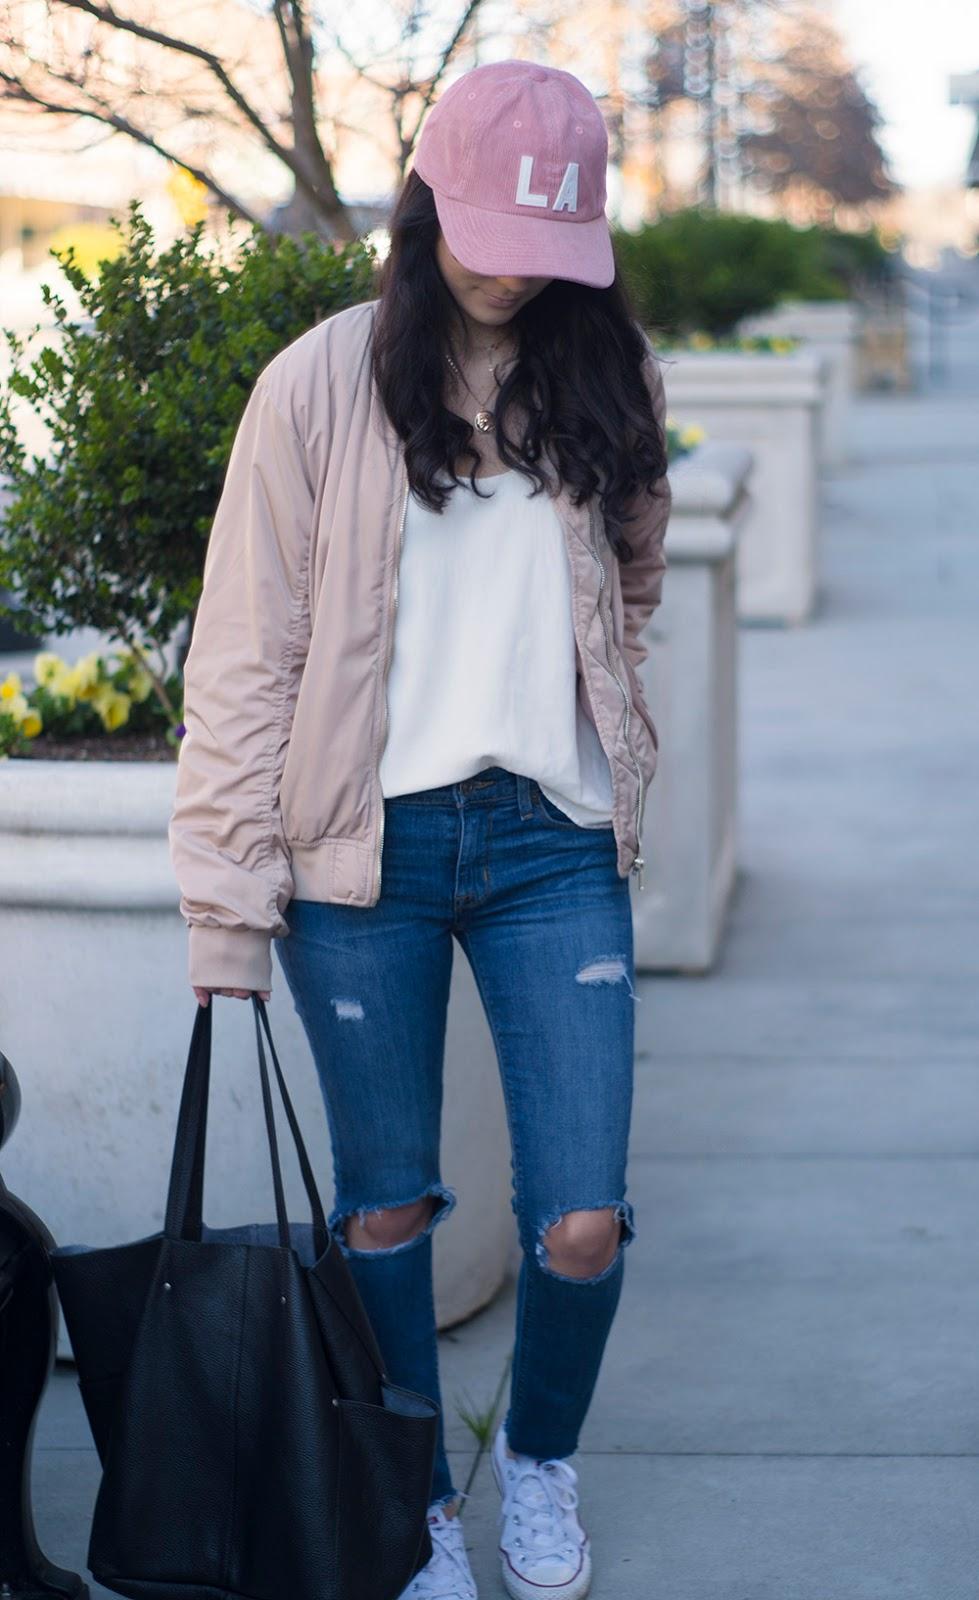 Hudson nico distressed skinny jeans, grana silk cami, hm bomber jacket, white converse